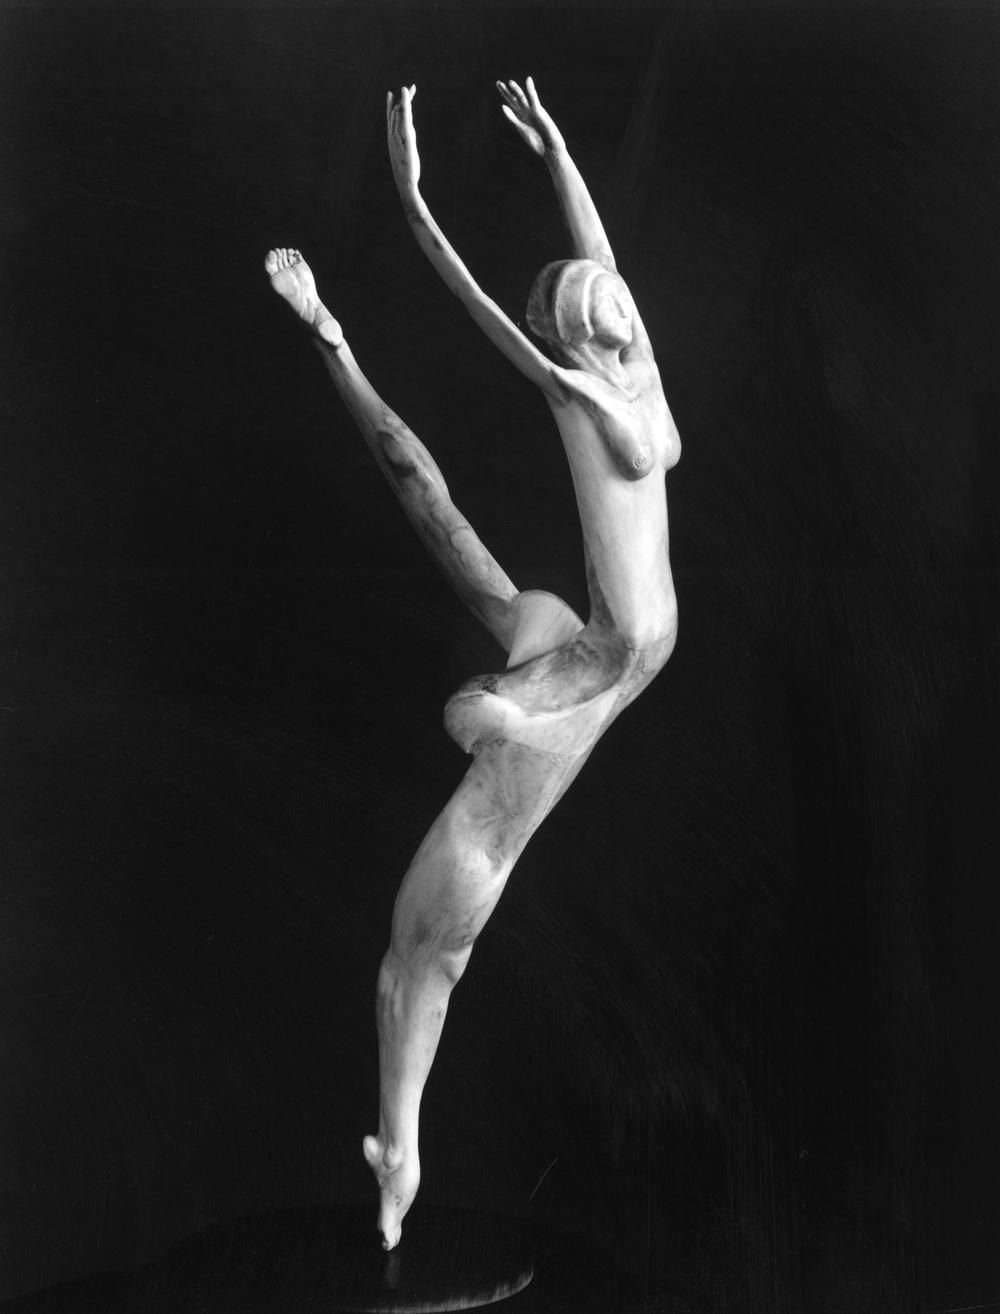 Arabesque - Ballet Dancer Bone Sculpture by Jerry Hardin